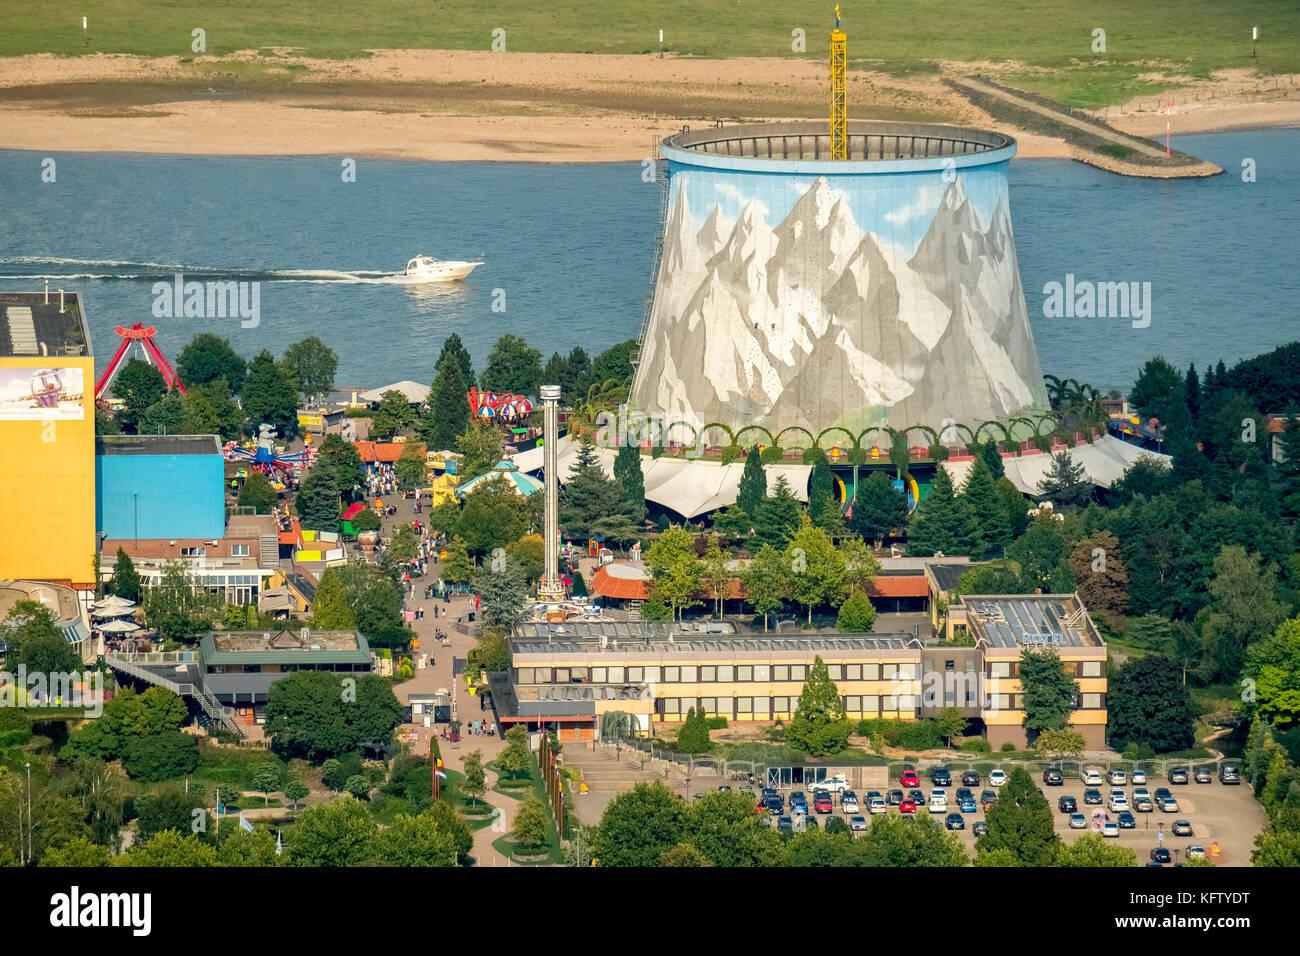 Wunderland Kalkar, amusement park, a former nuclear power plant Kalkar am Rhein, core water wonderland painted cooling - Stock Image